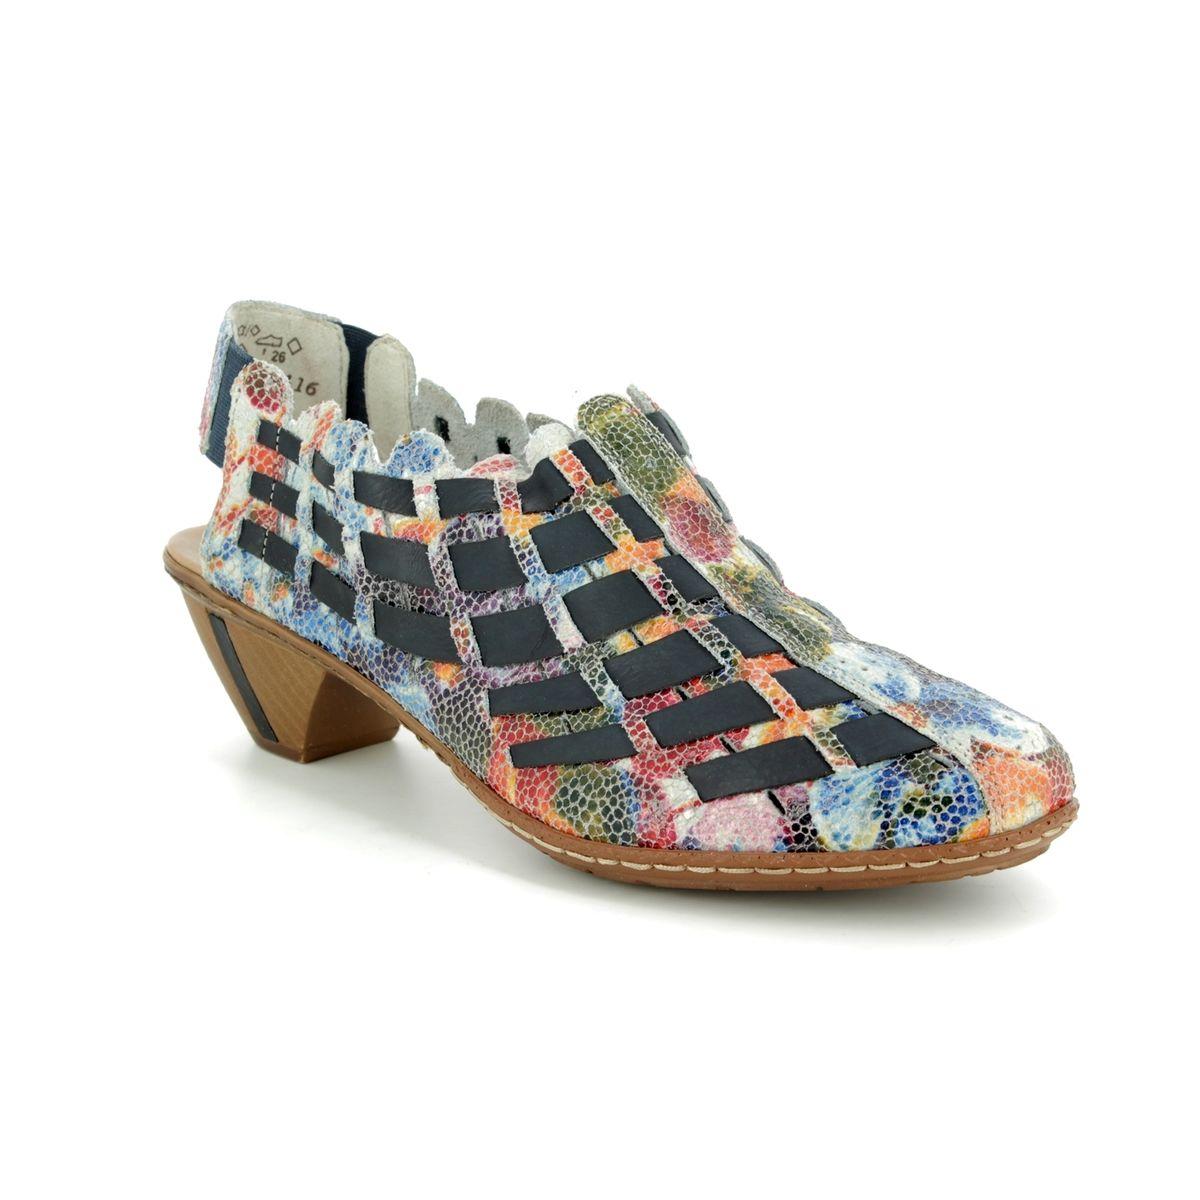 12e9a985cca Rieker Heeled Shoes - Floral print - 46778-91 SINA